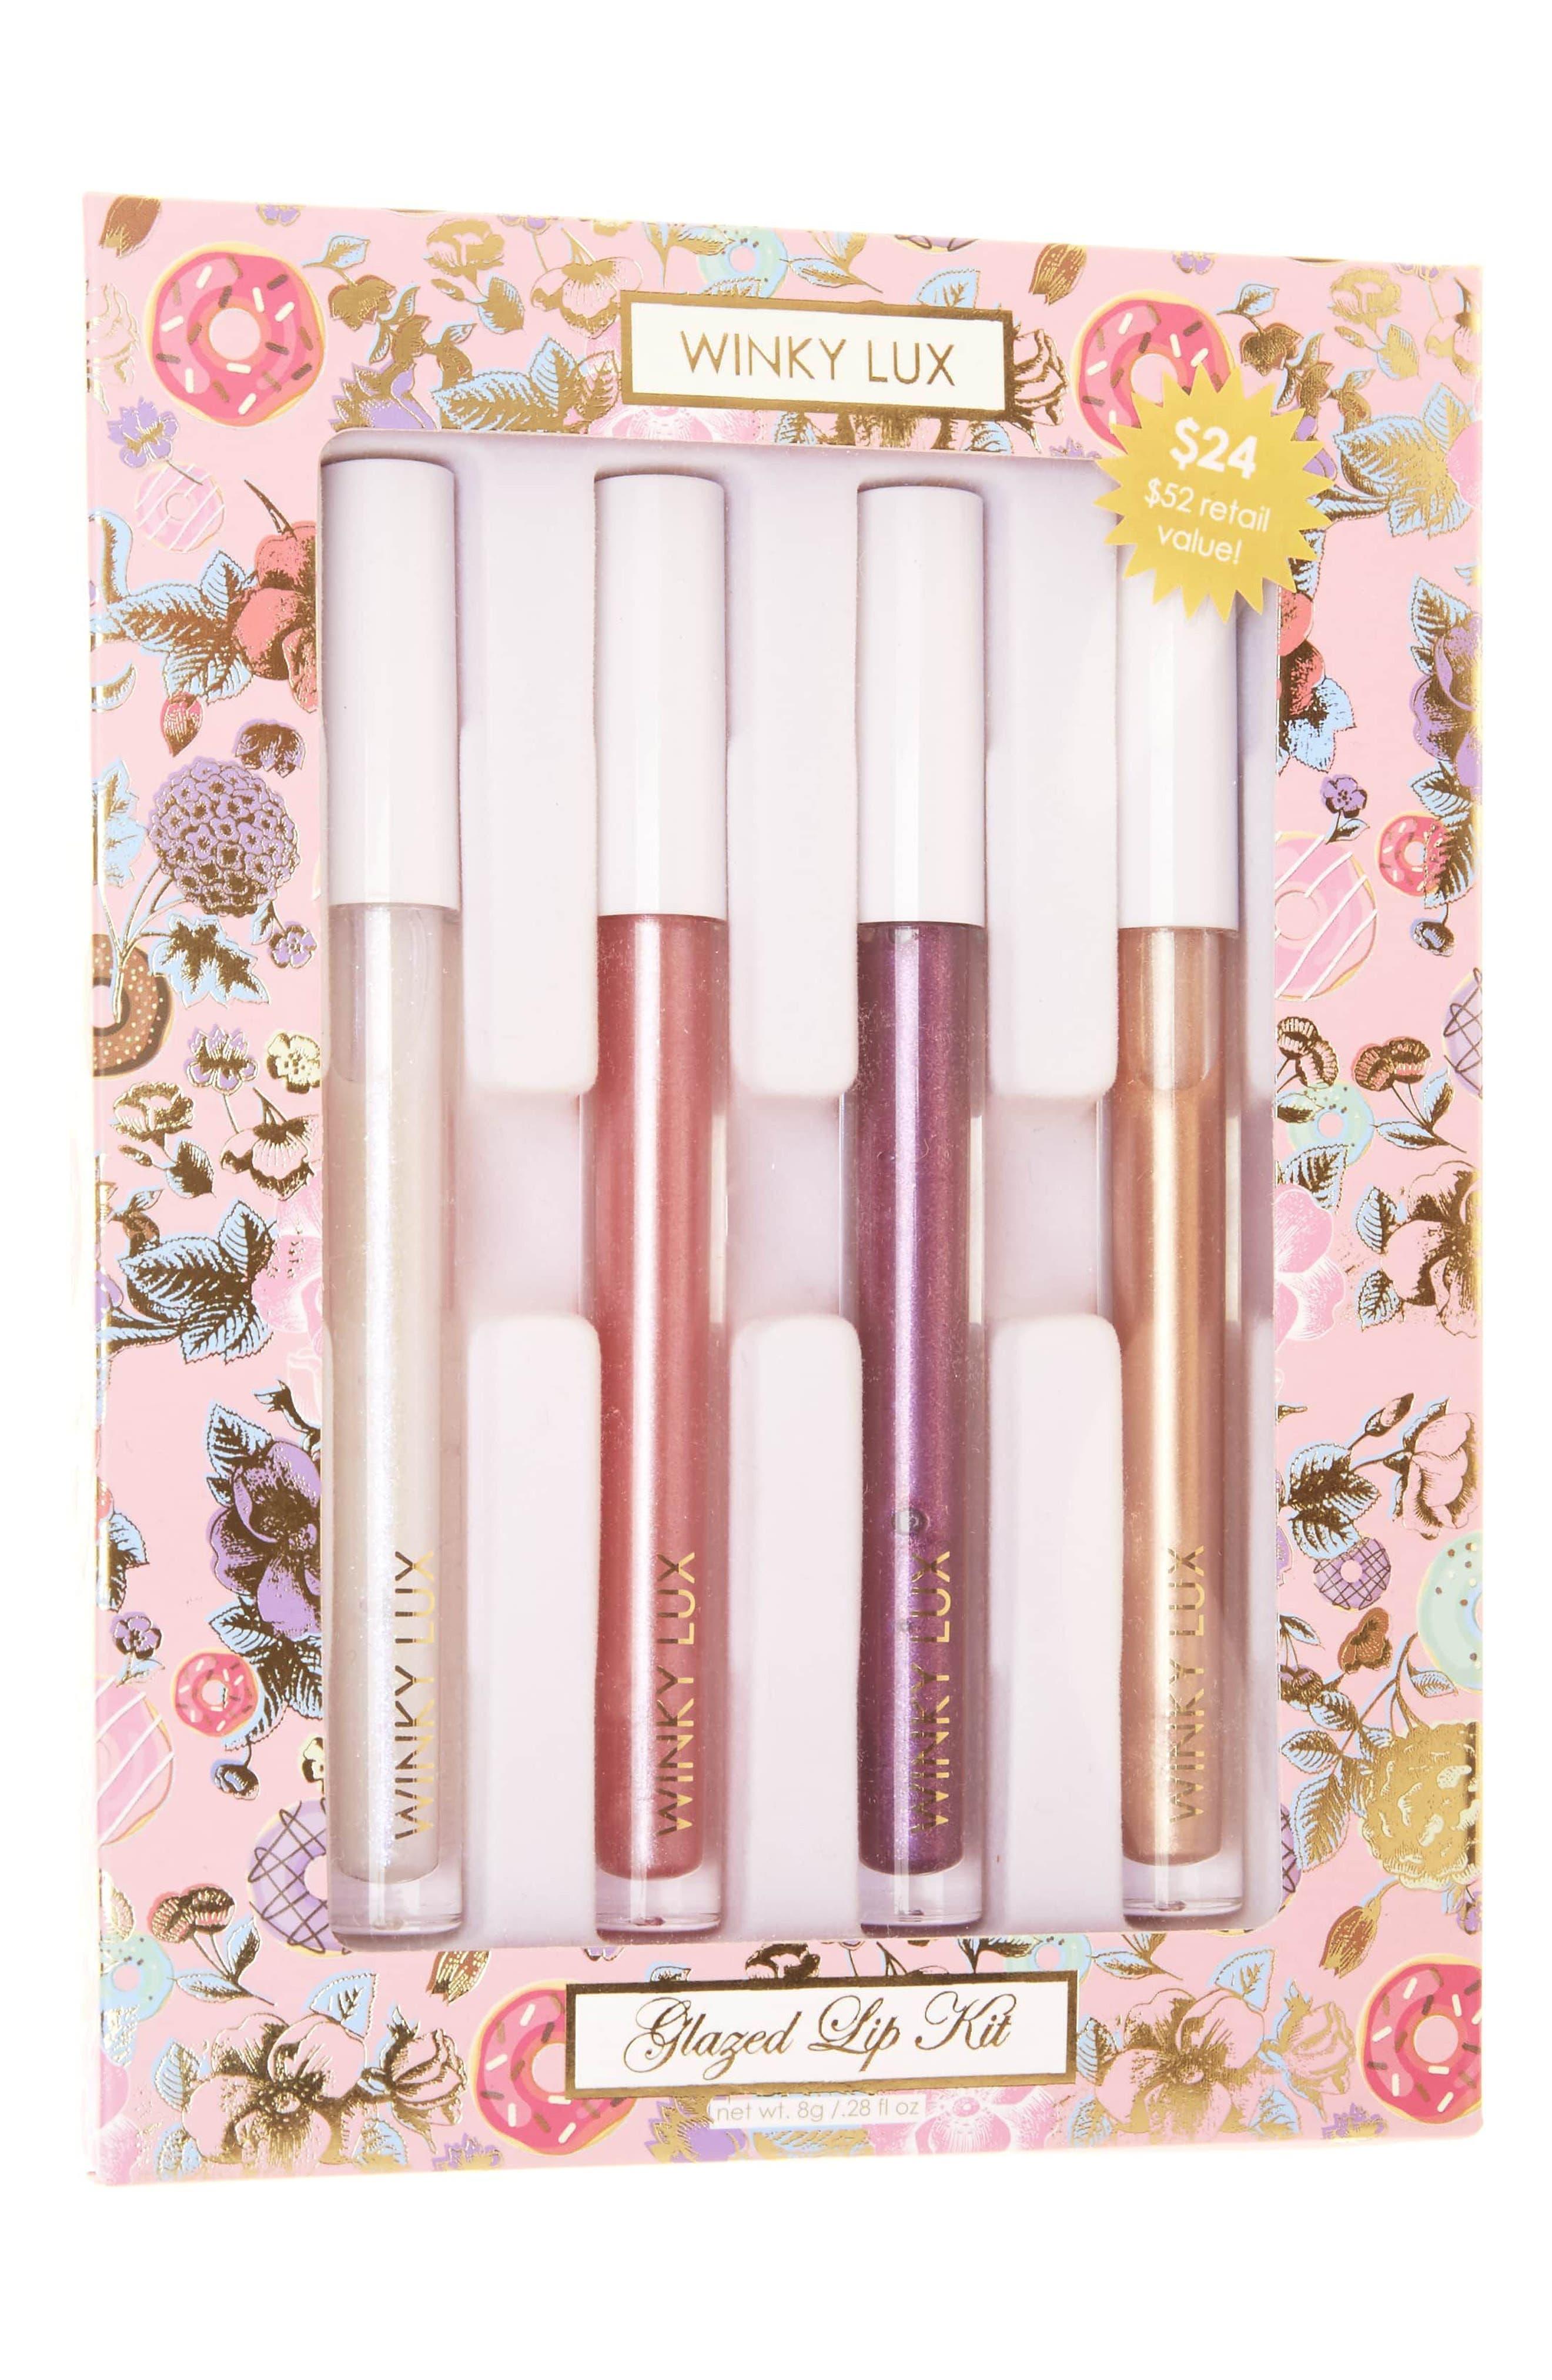 WINKY LUX, Glazed Lip Kit, Main thumbnail 1, color, 000